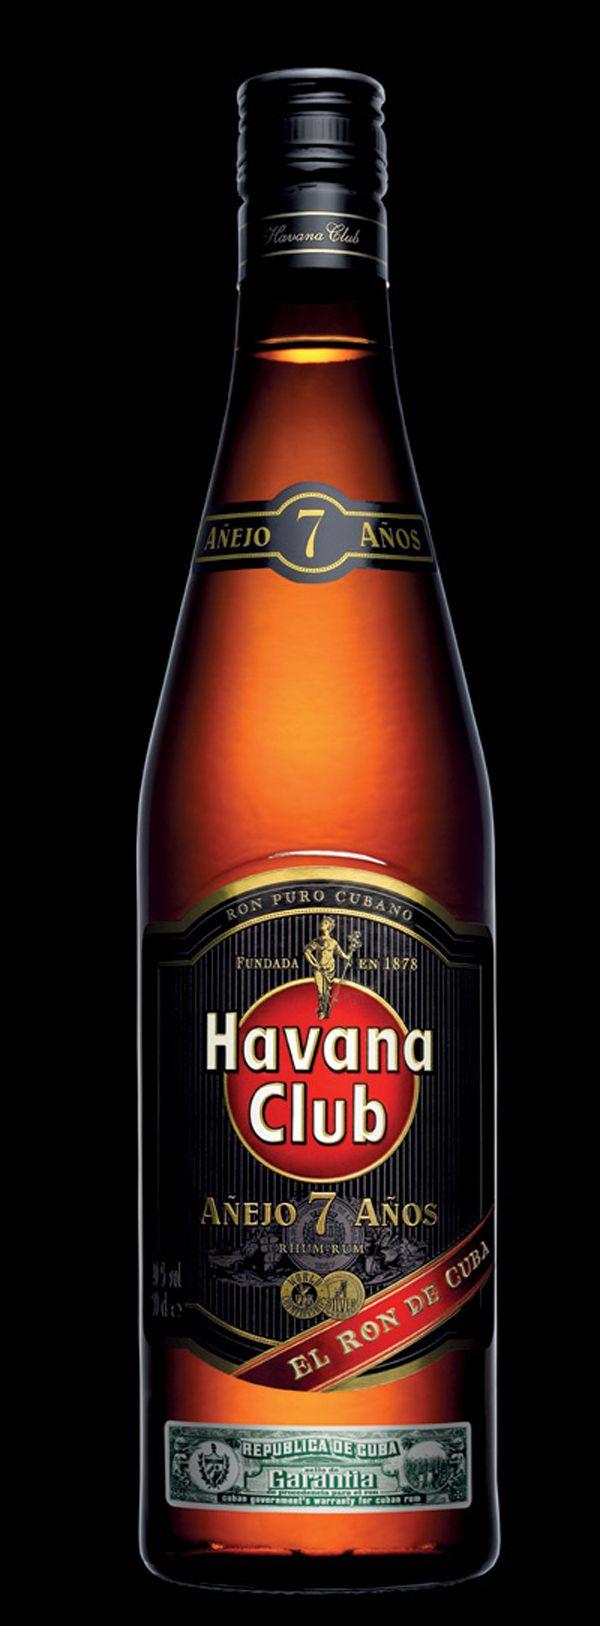 Havana Club Art And Design Inspiration From Around The World Creativeroots Havana Club Havana Club Rum Havana